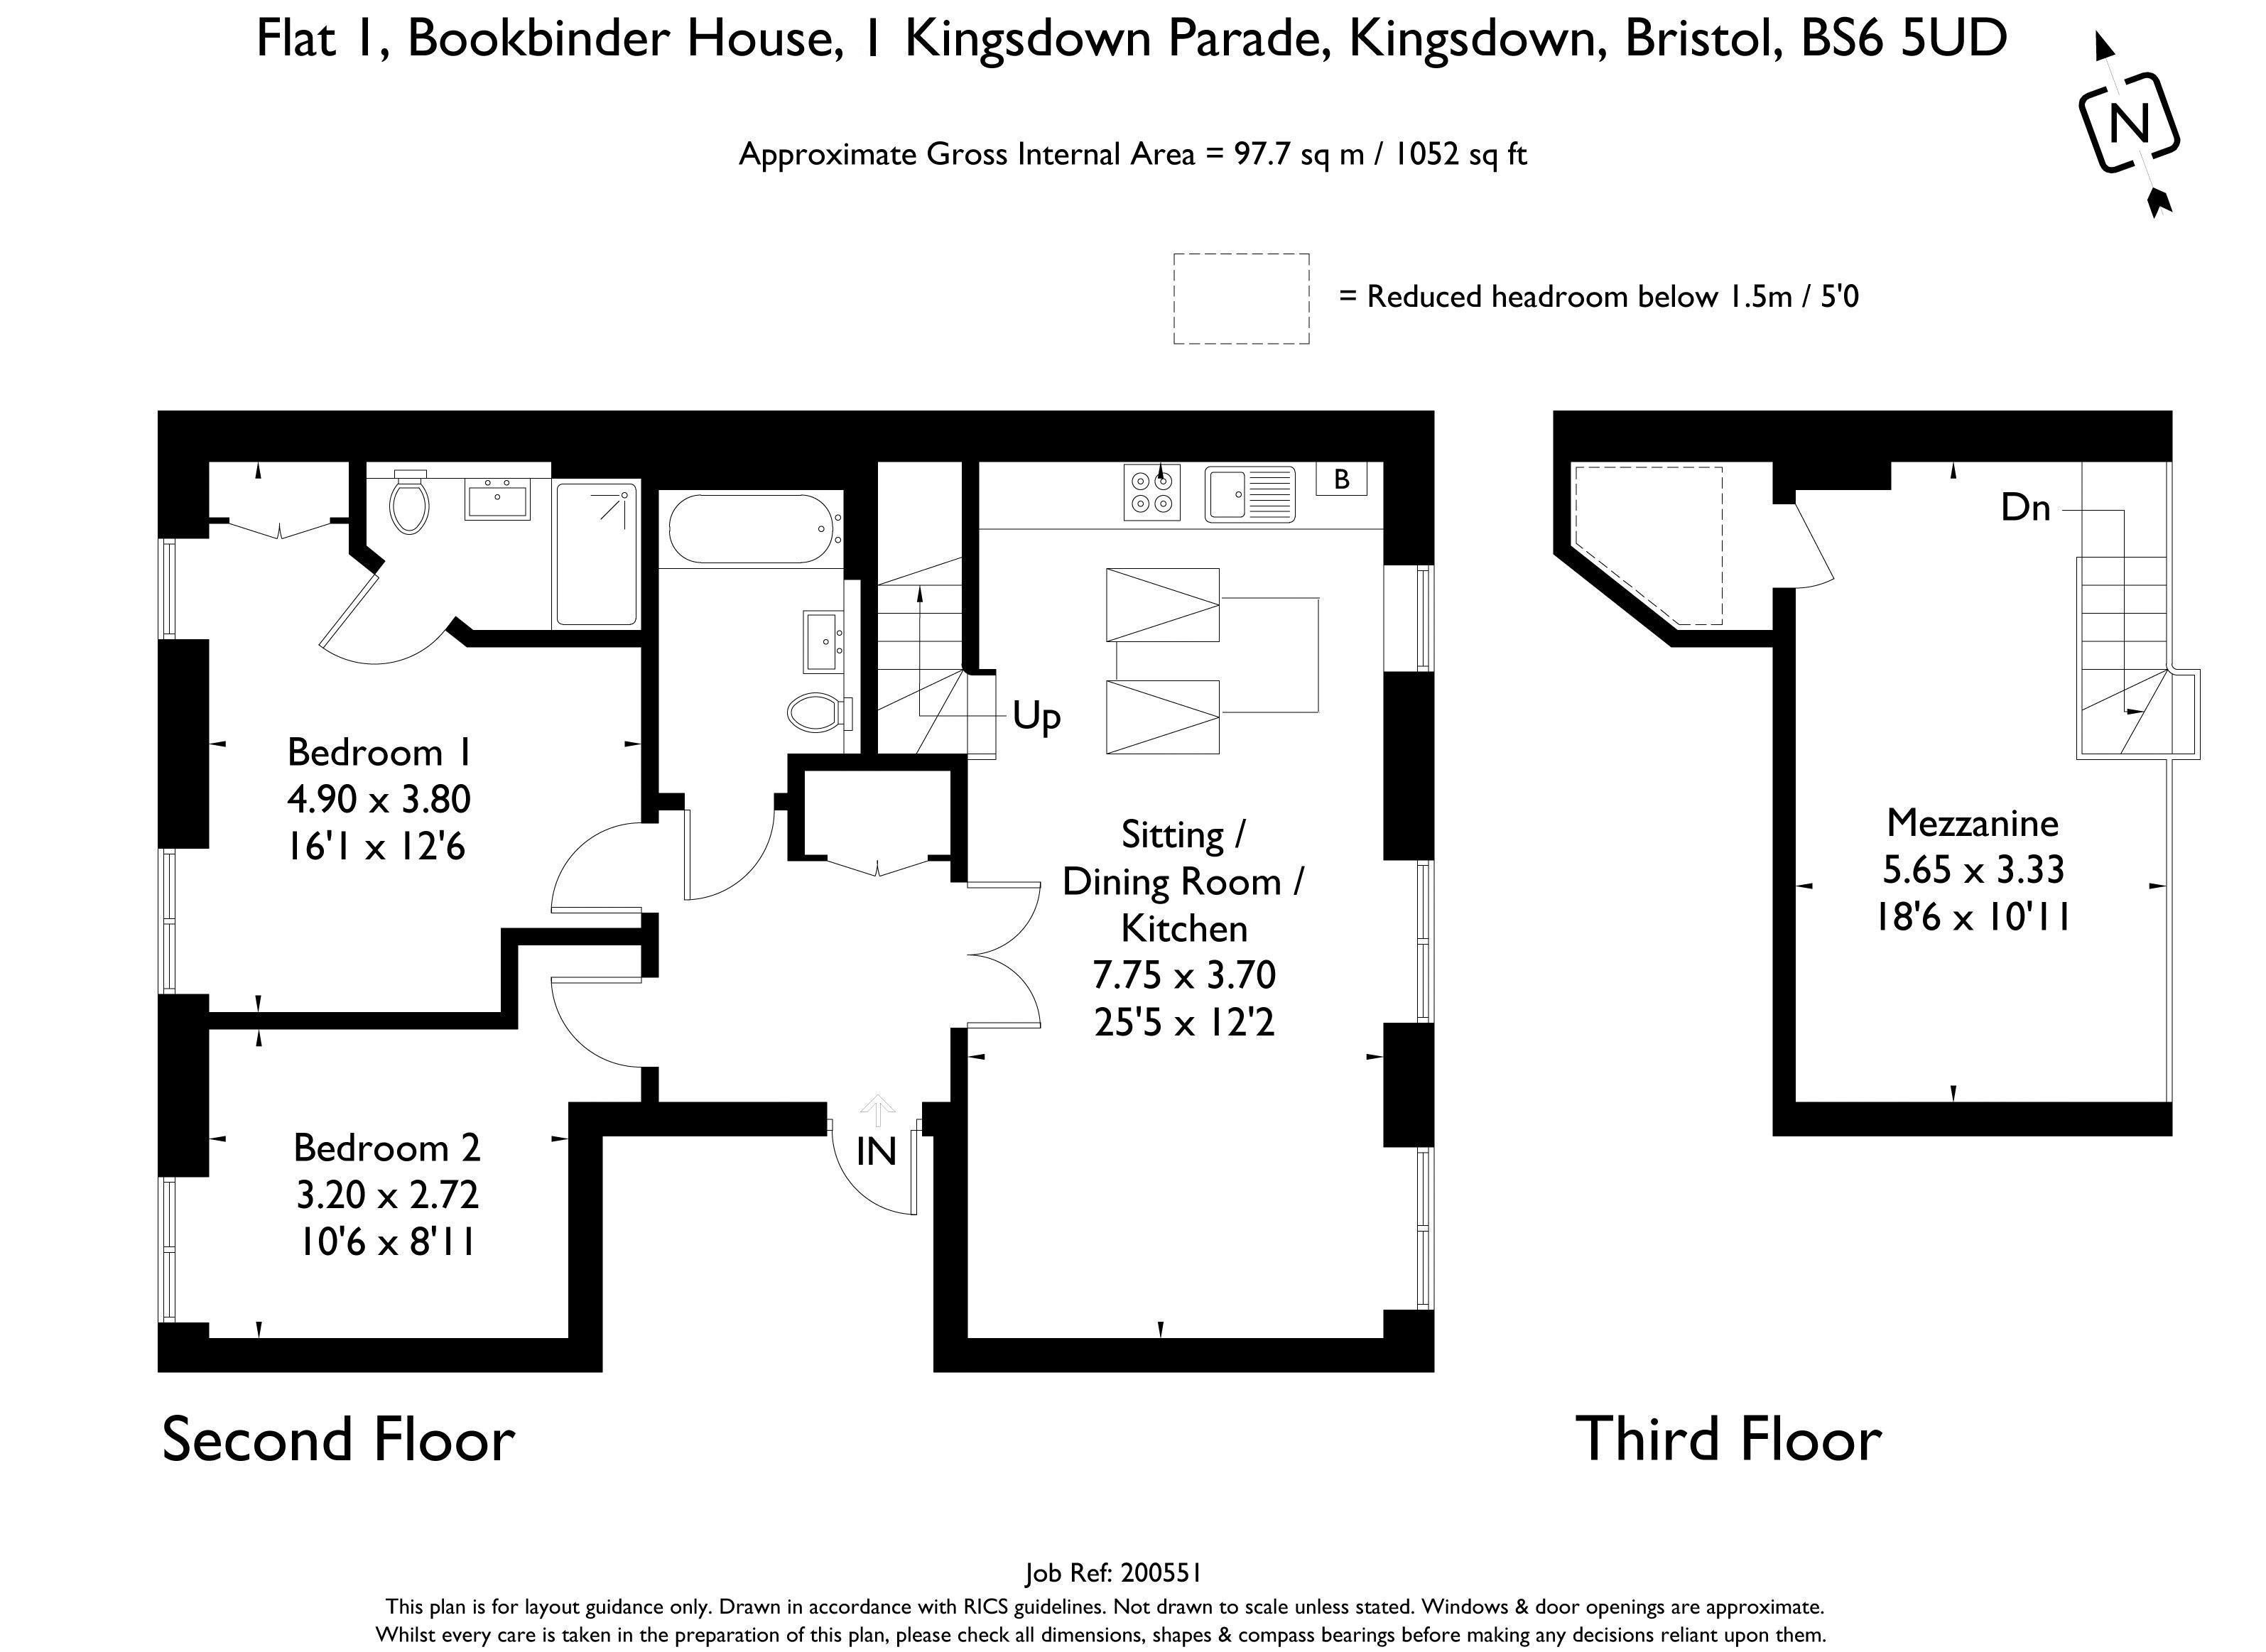 Kingsdown Parade, Kingsdown Guide Price 475,000